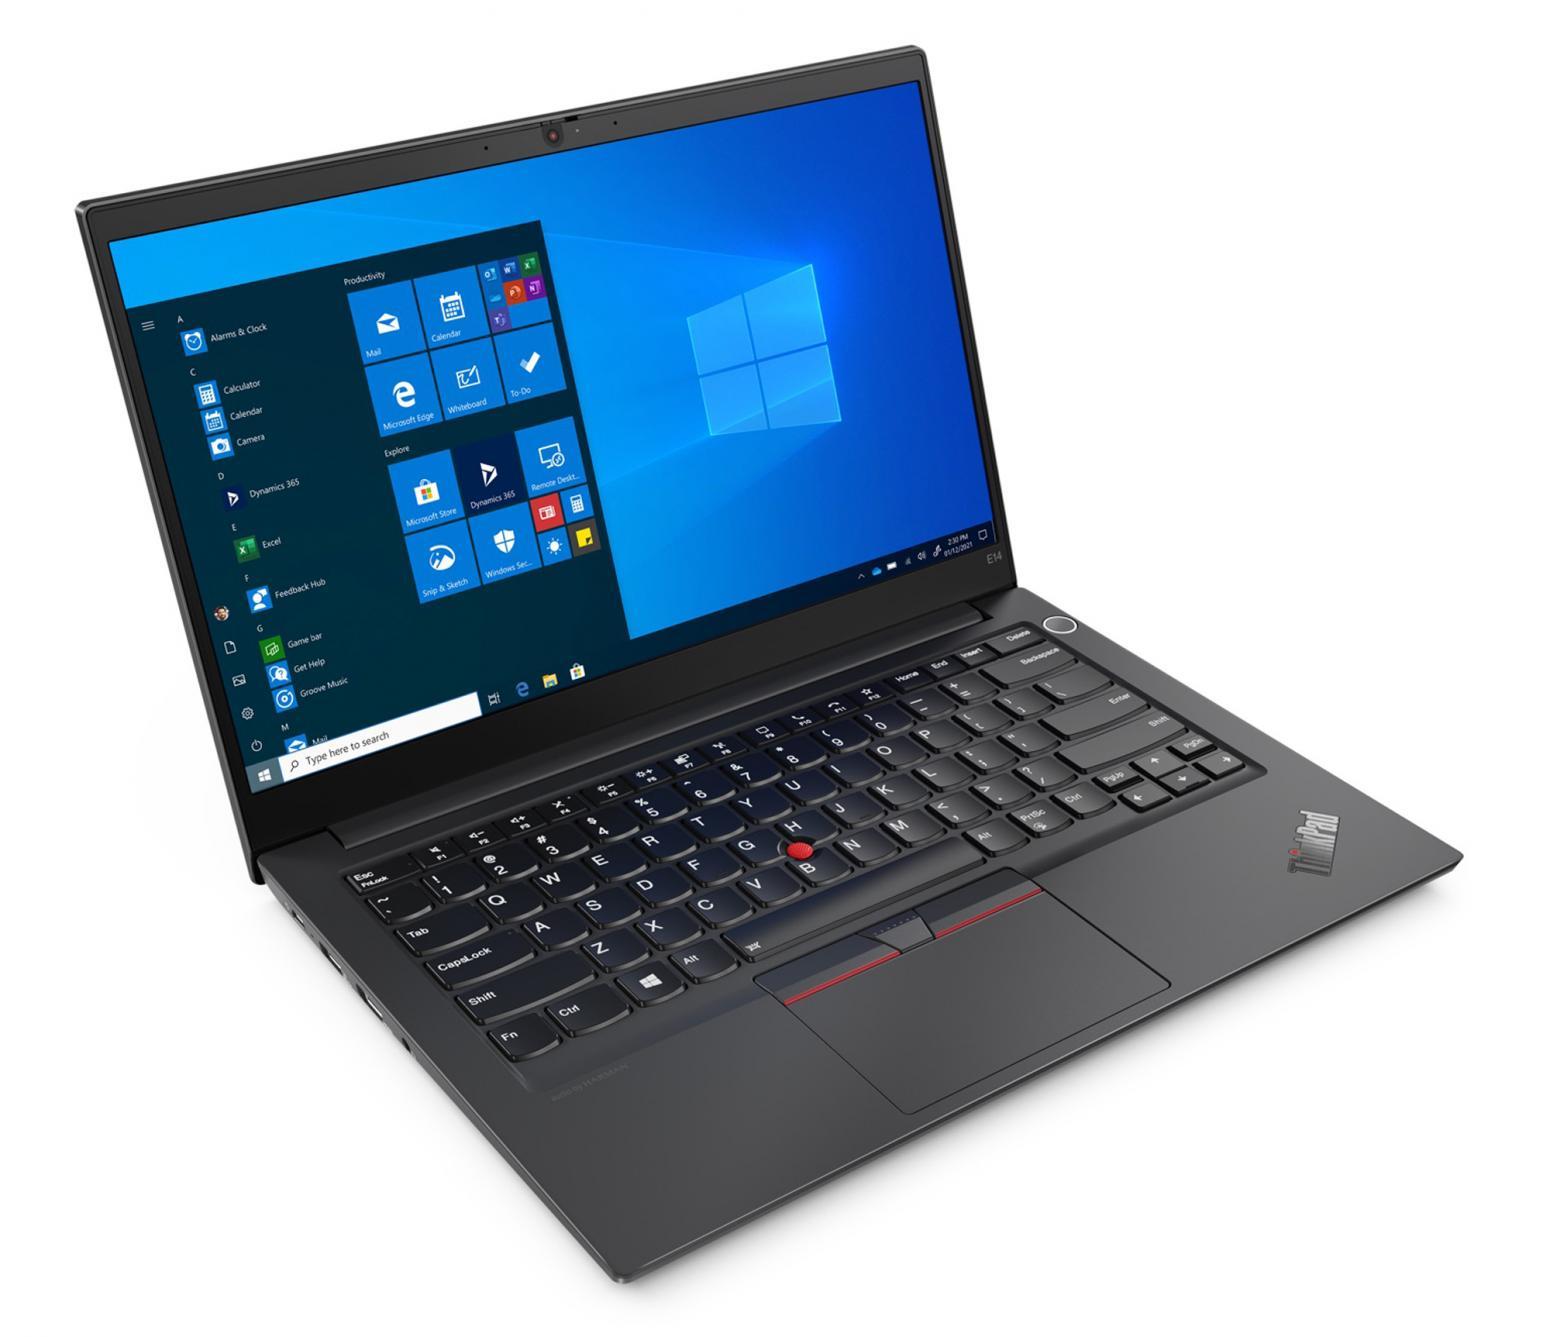 Ordinateur portable Lenovo ThinkPad E14 AMD Gen 3 (20Y7003RFR) Argent - Ryzen 5, Pro - photo 8